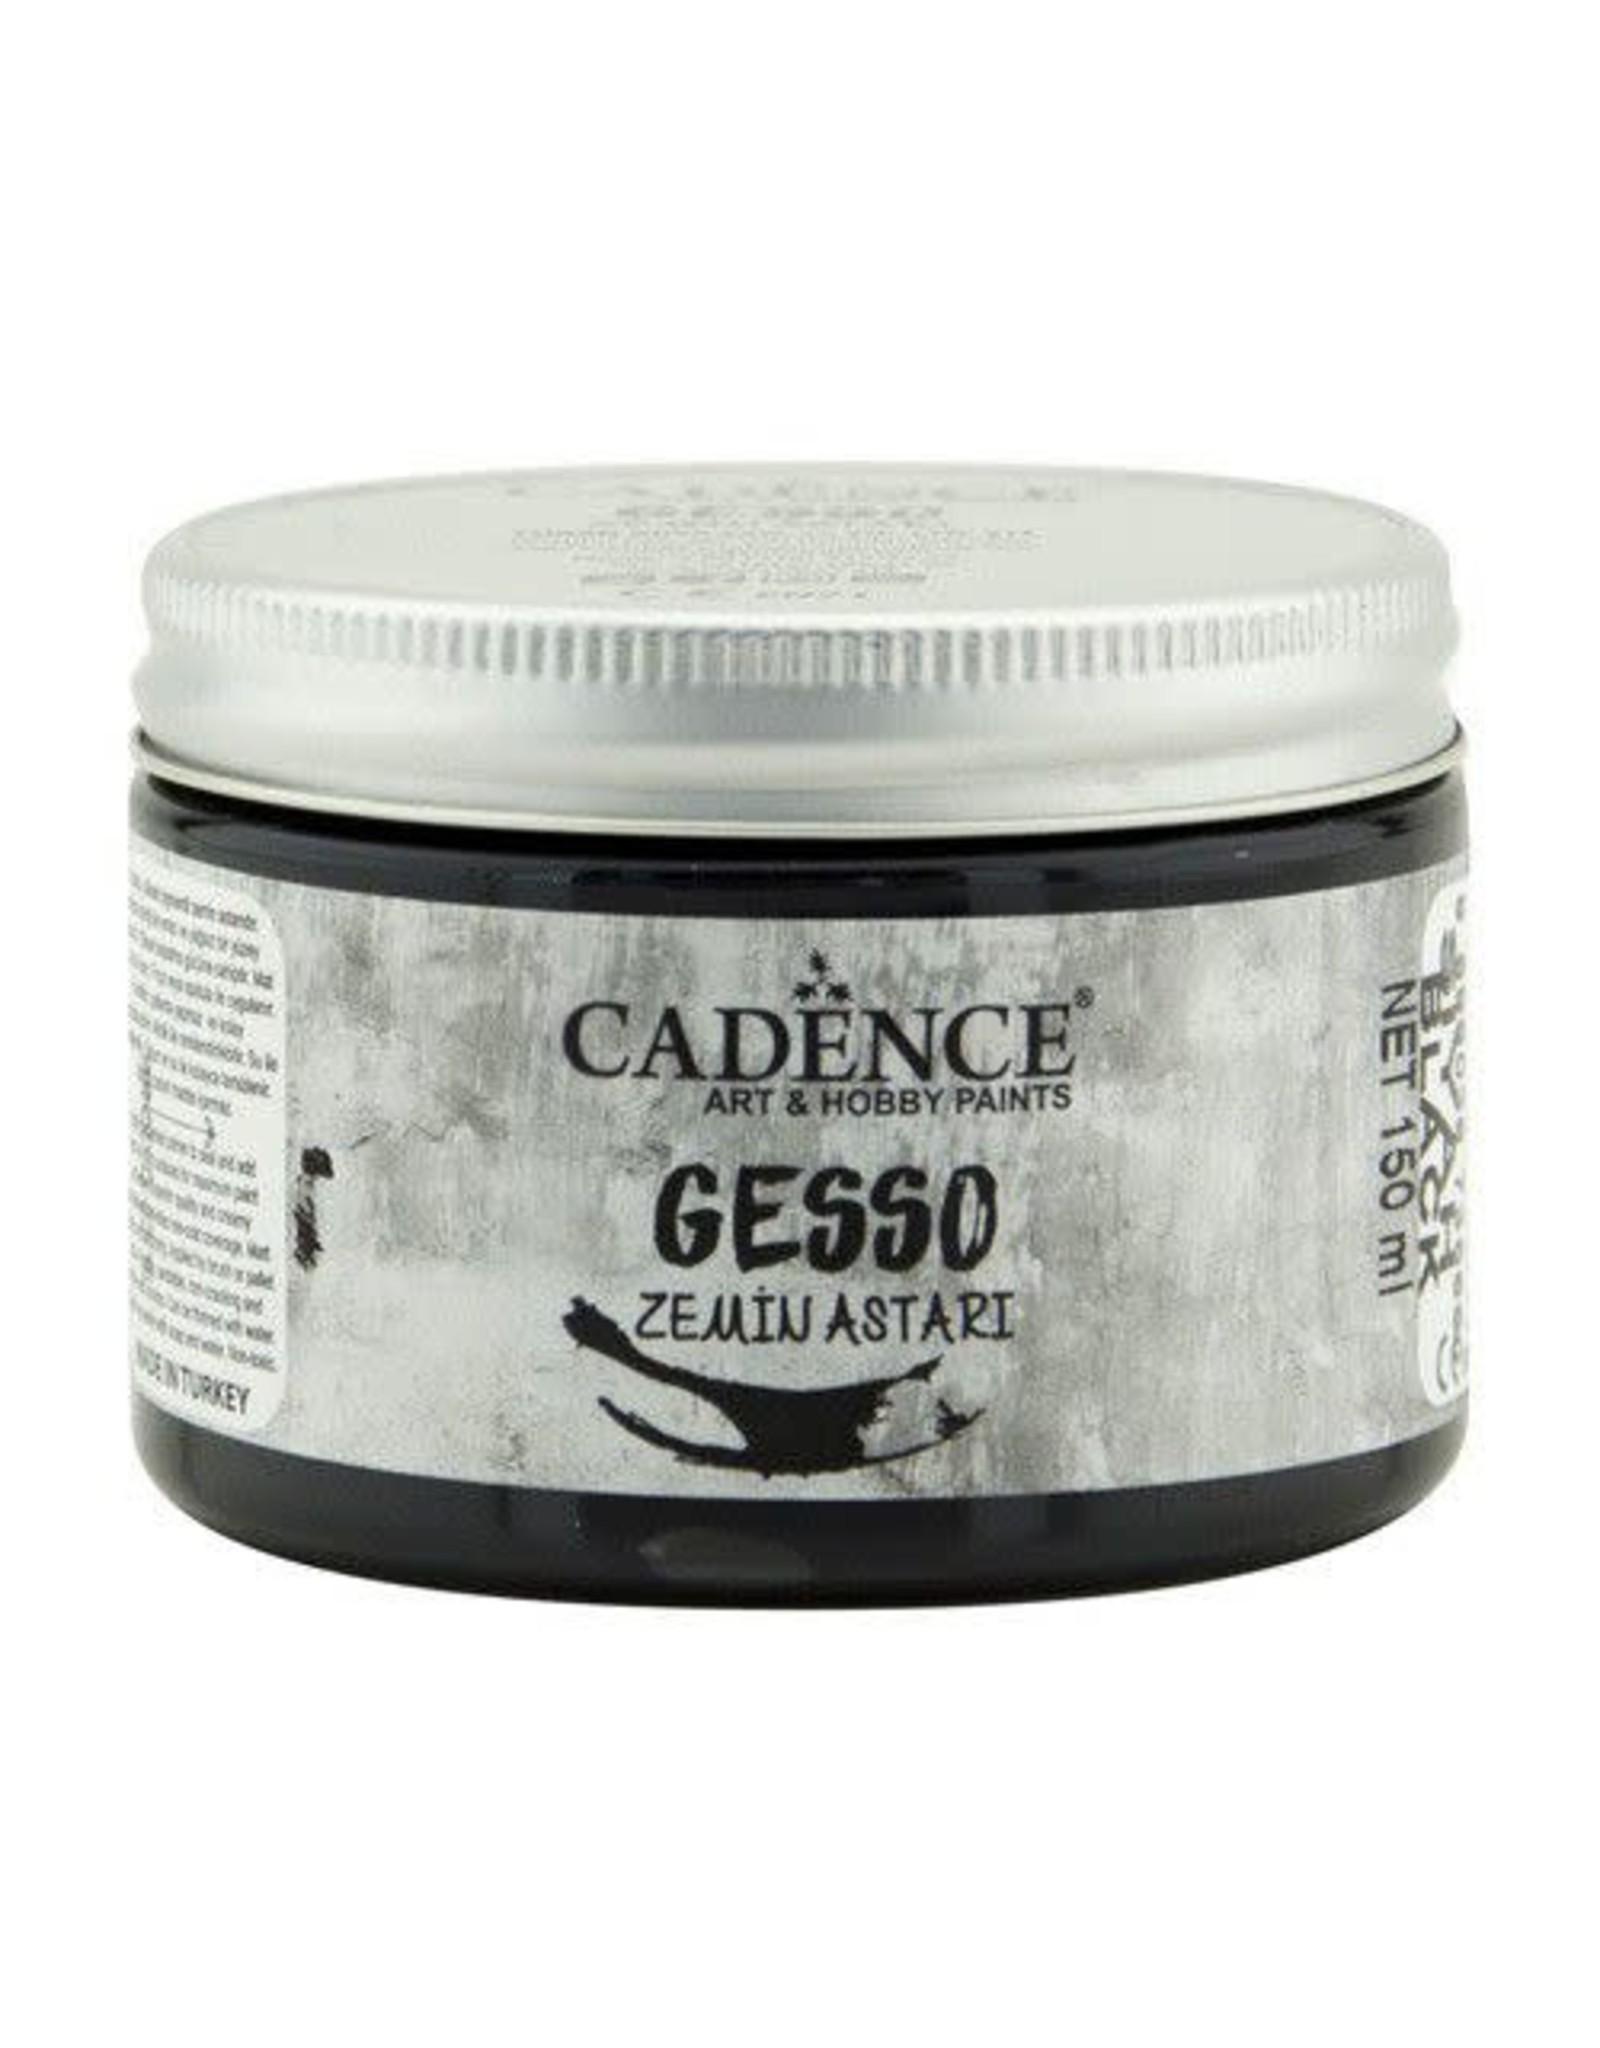 Cadence Cadence gesso acrylverf zwart  150ml